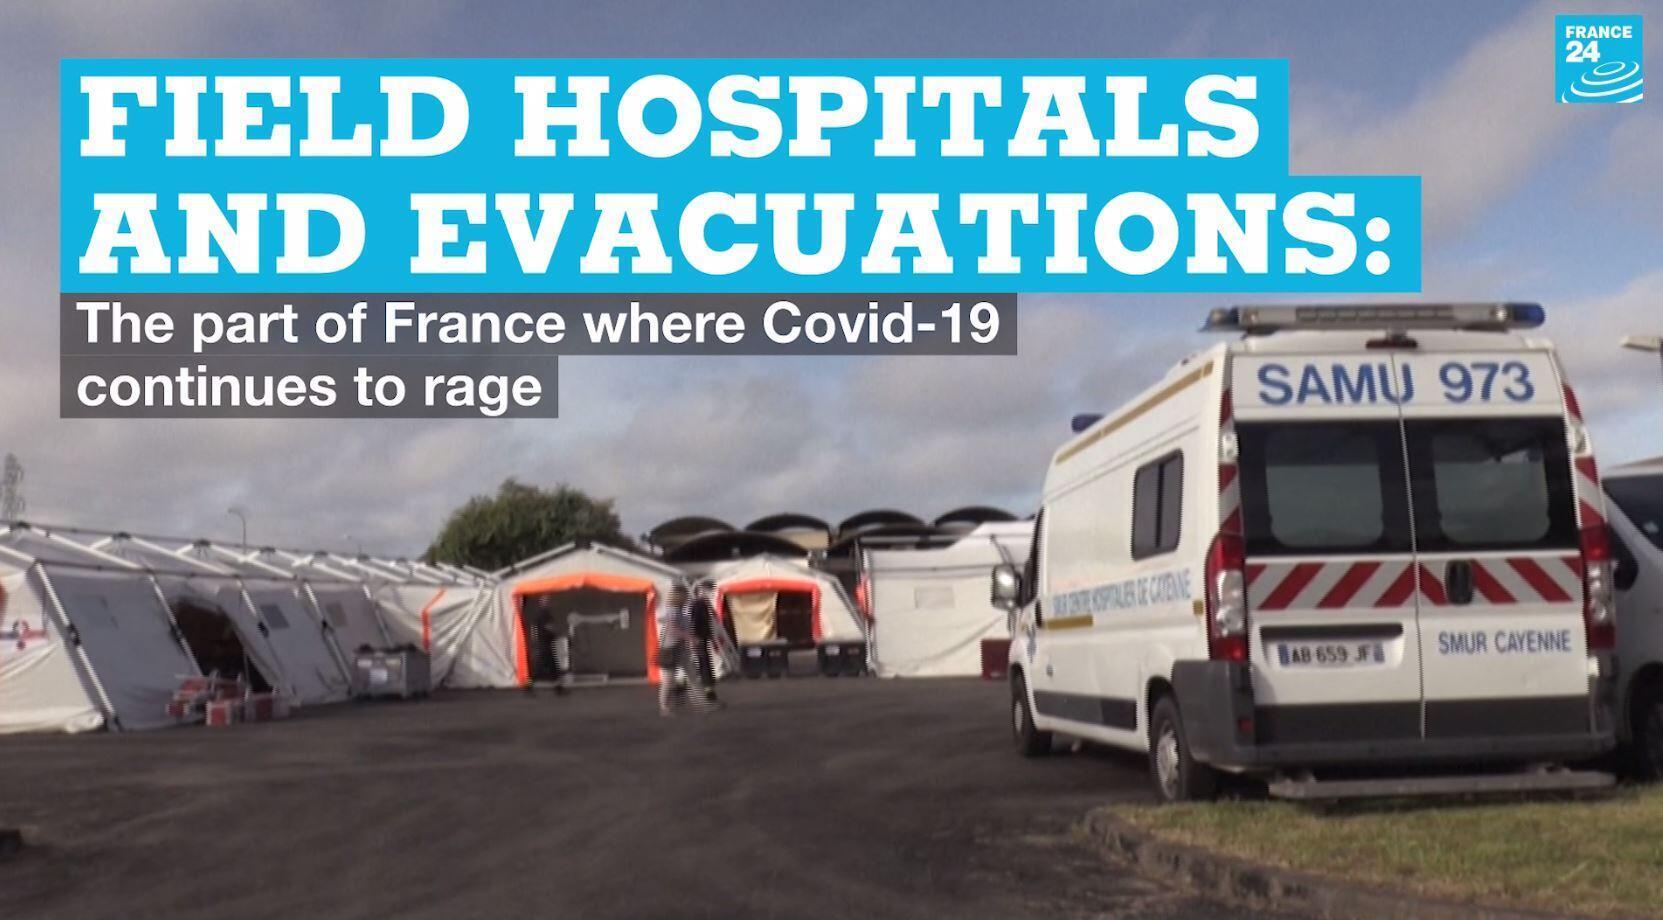 A field hospital in French Guiana.